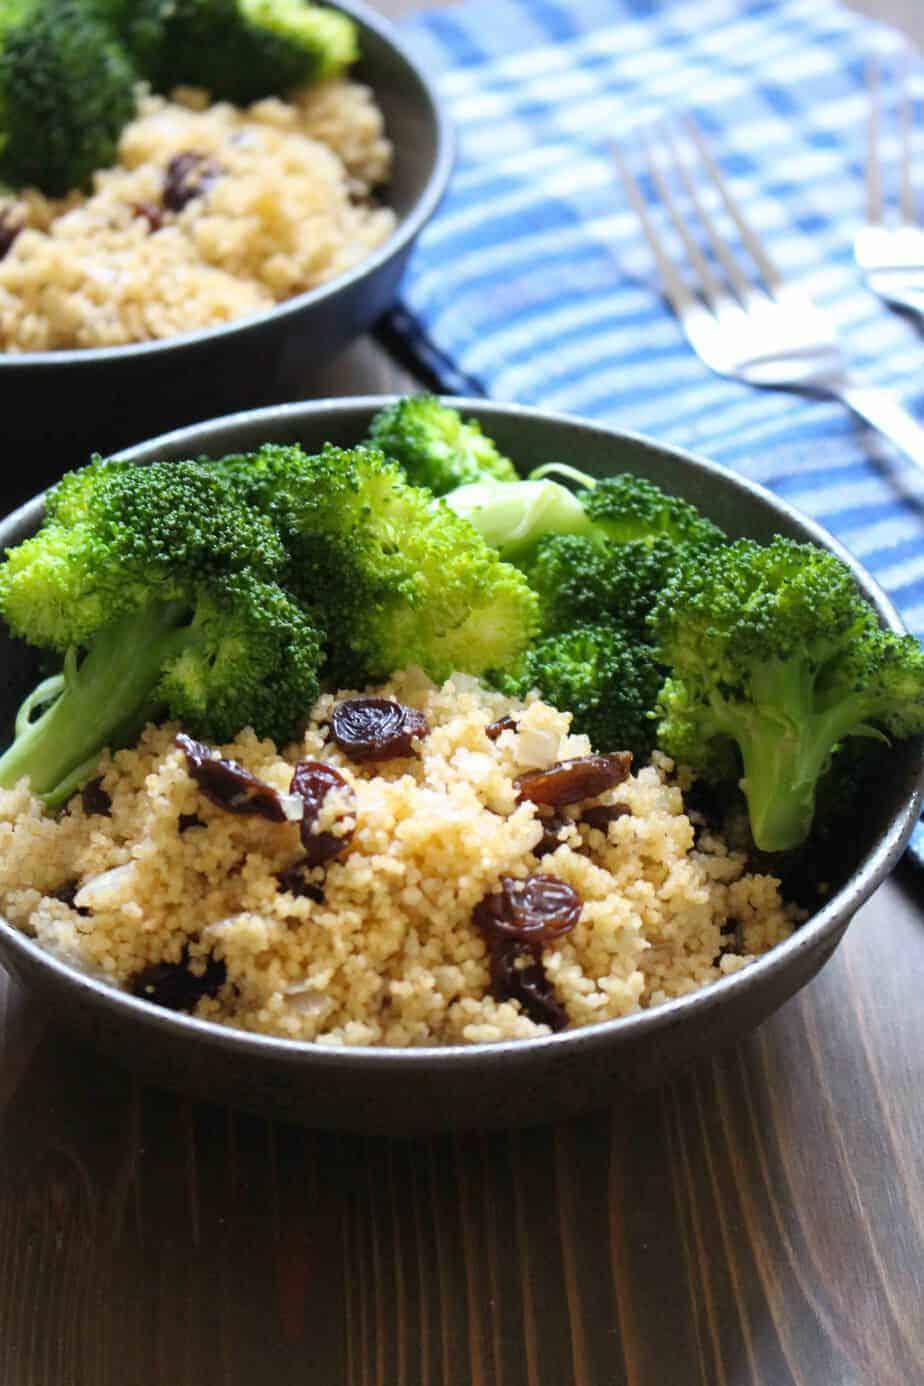 Spiced Couscous & Raisins | Frugal Nutrition #easydinner